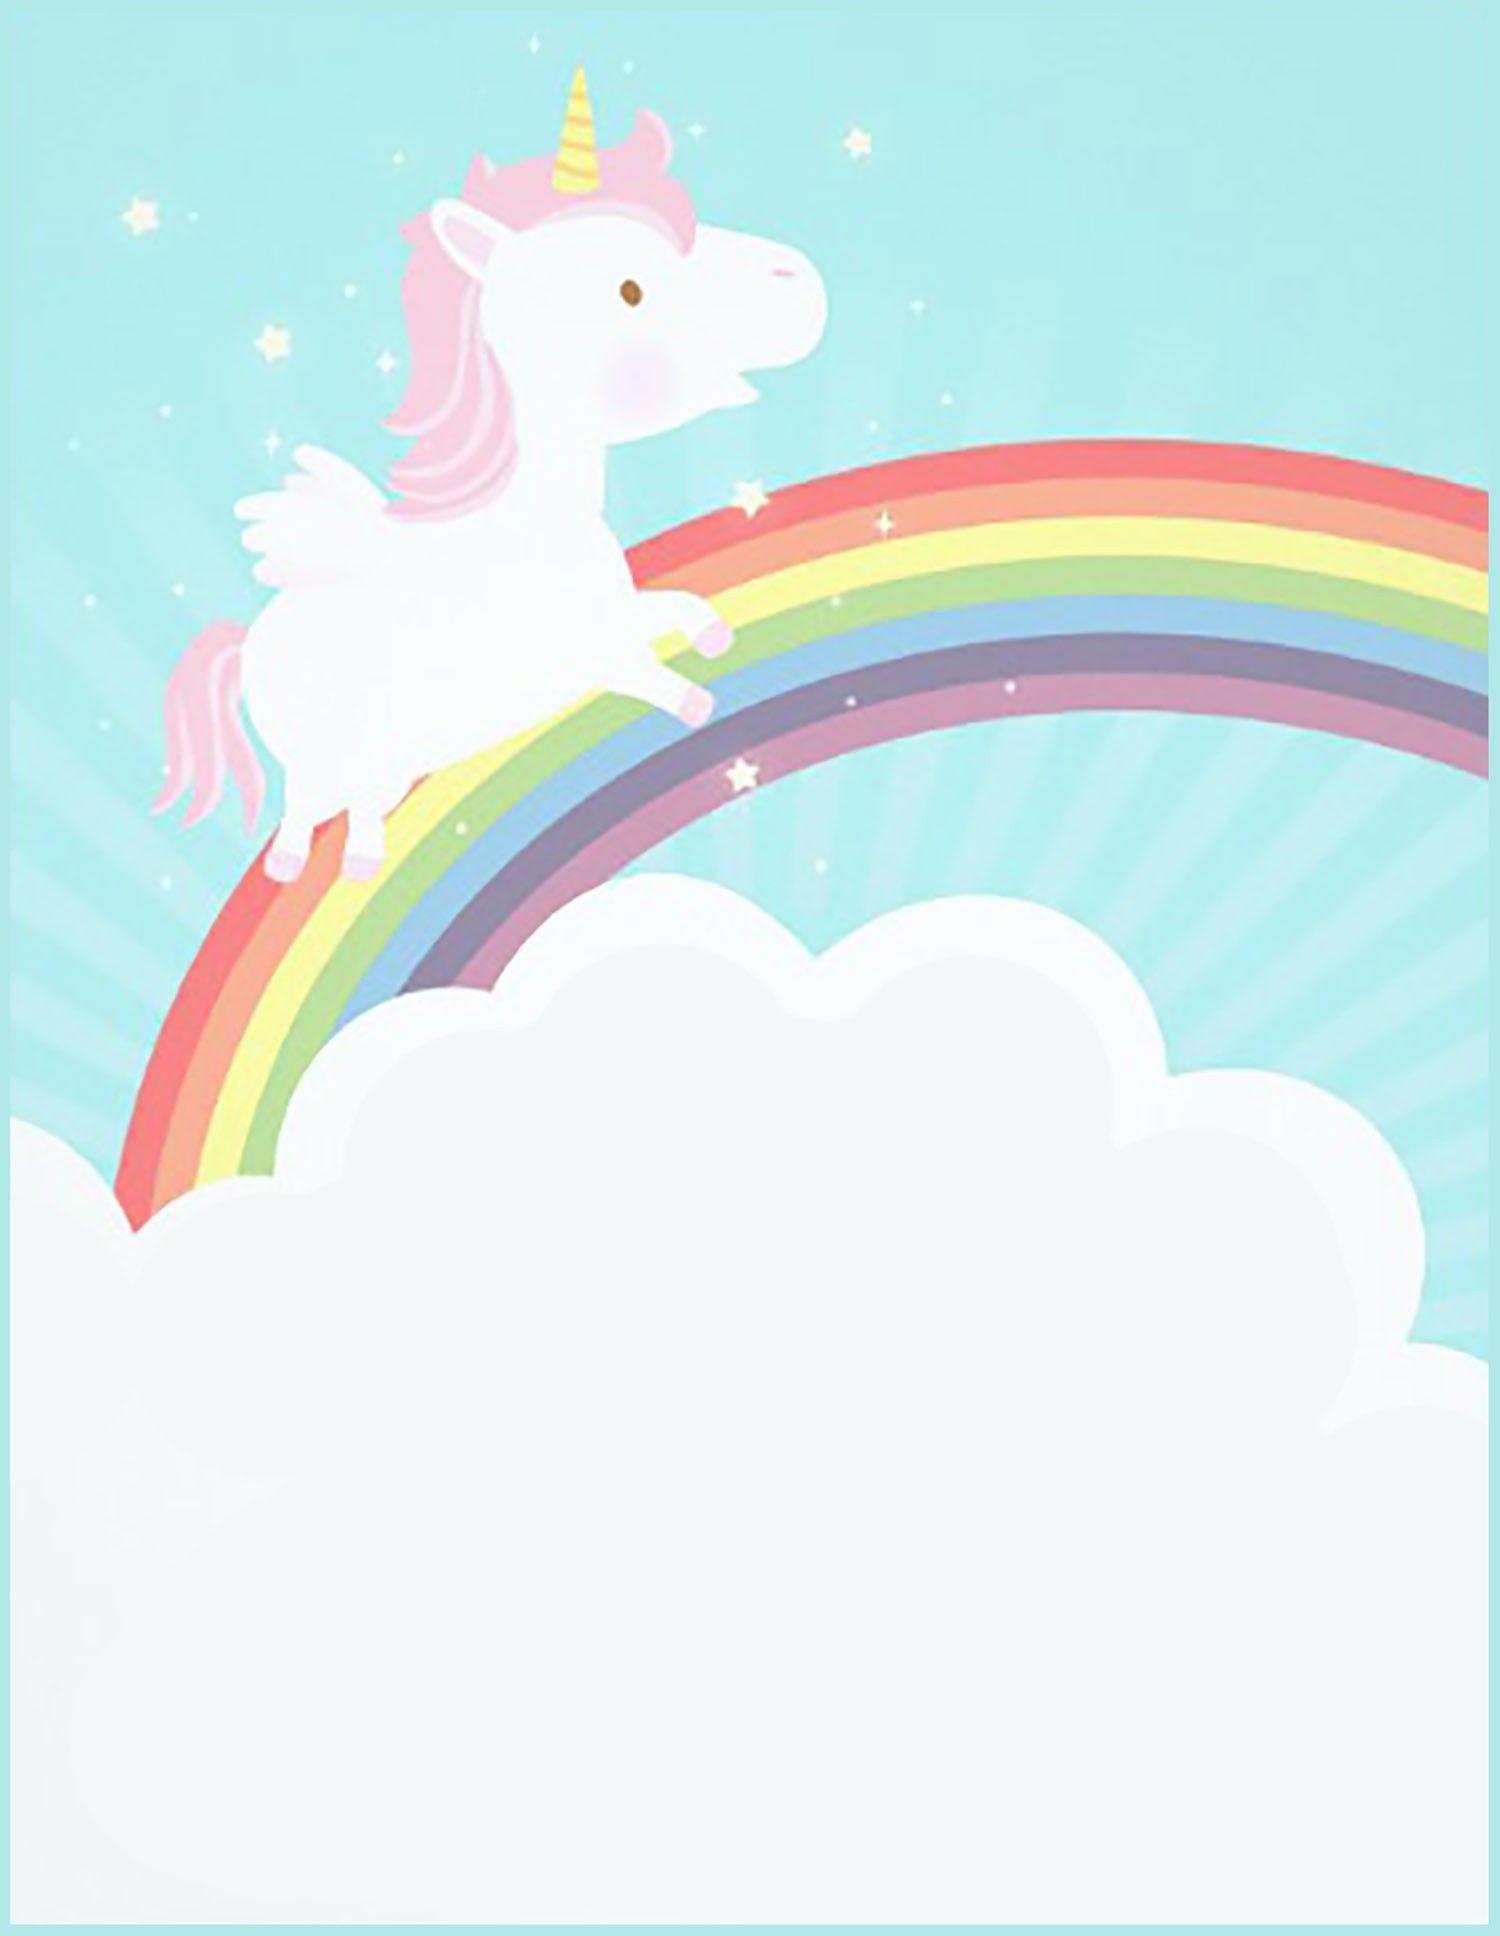 Free Printable Unicorn Invitation Card | unicorn | Pinterest ...